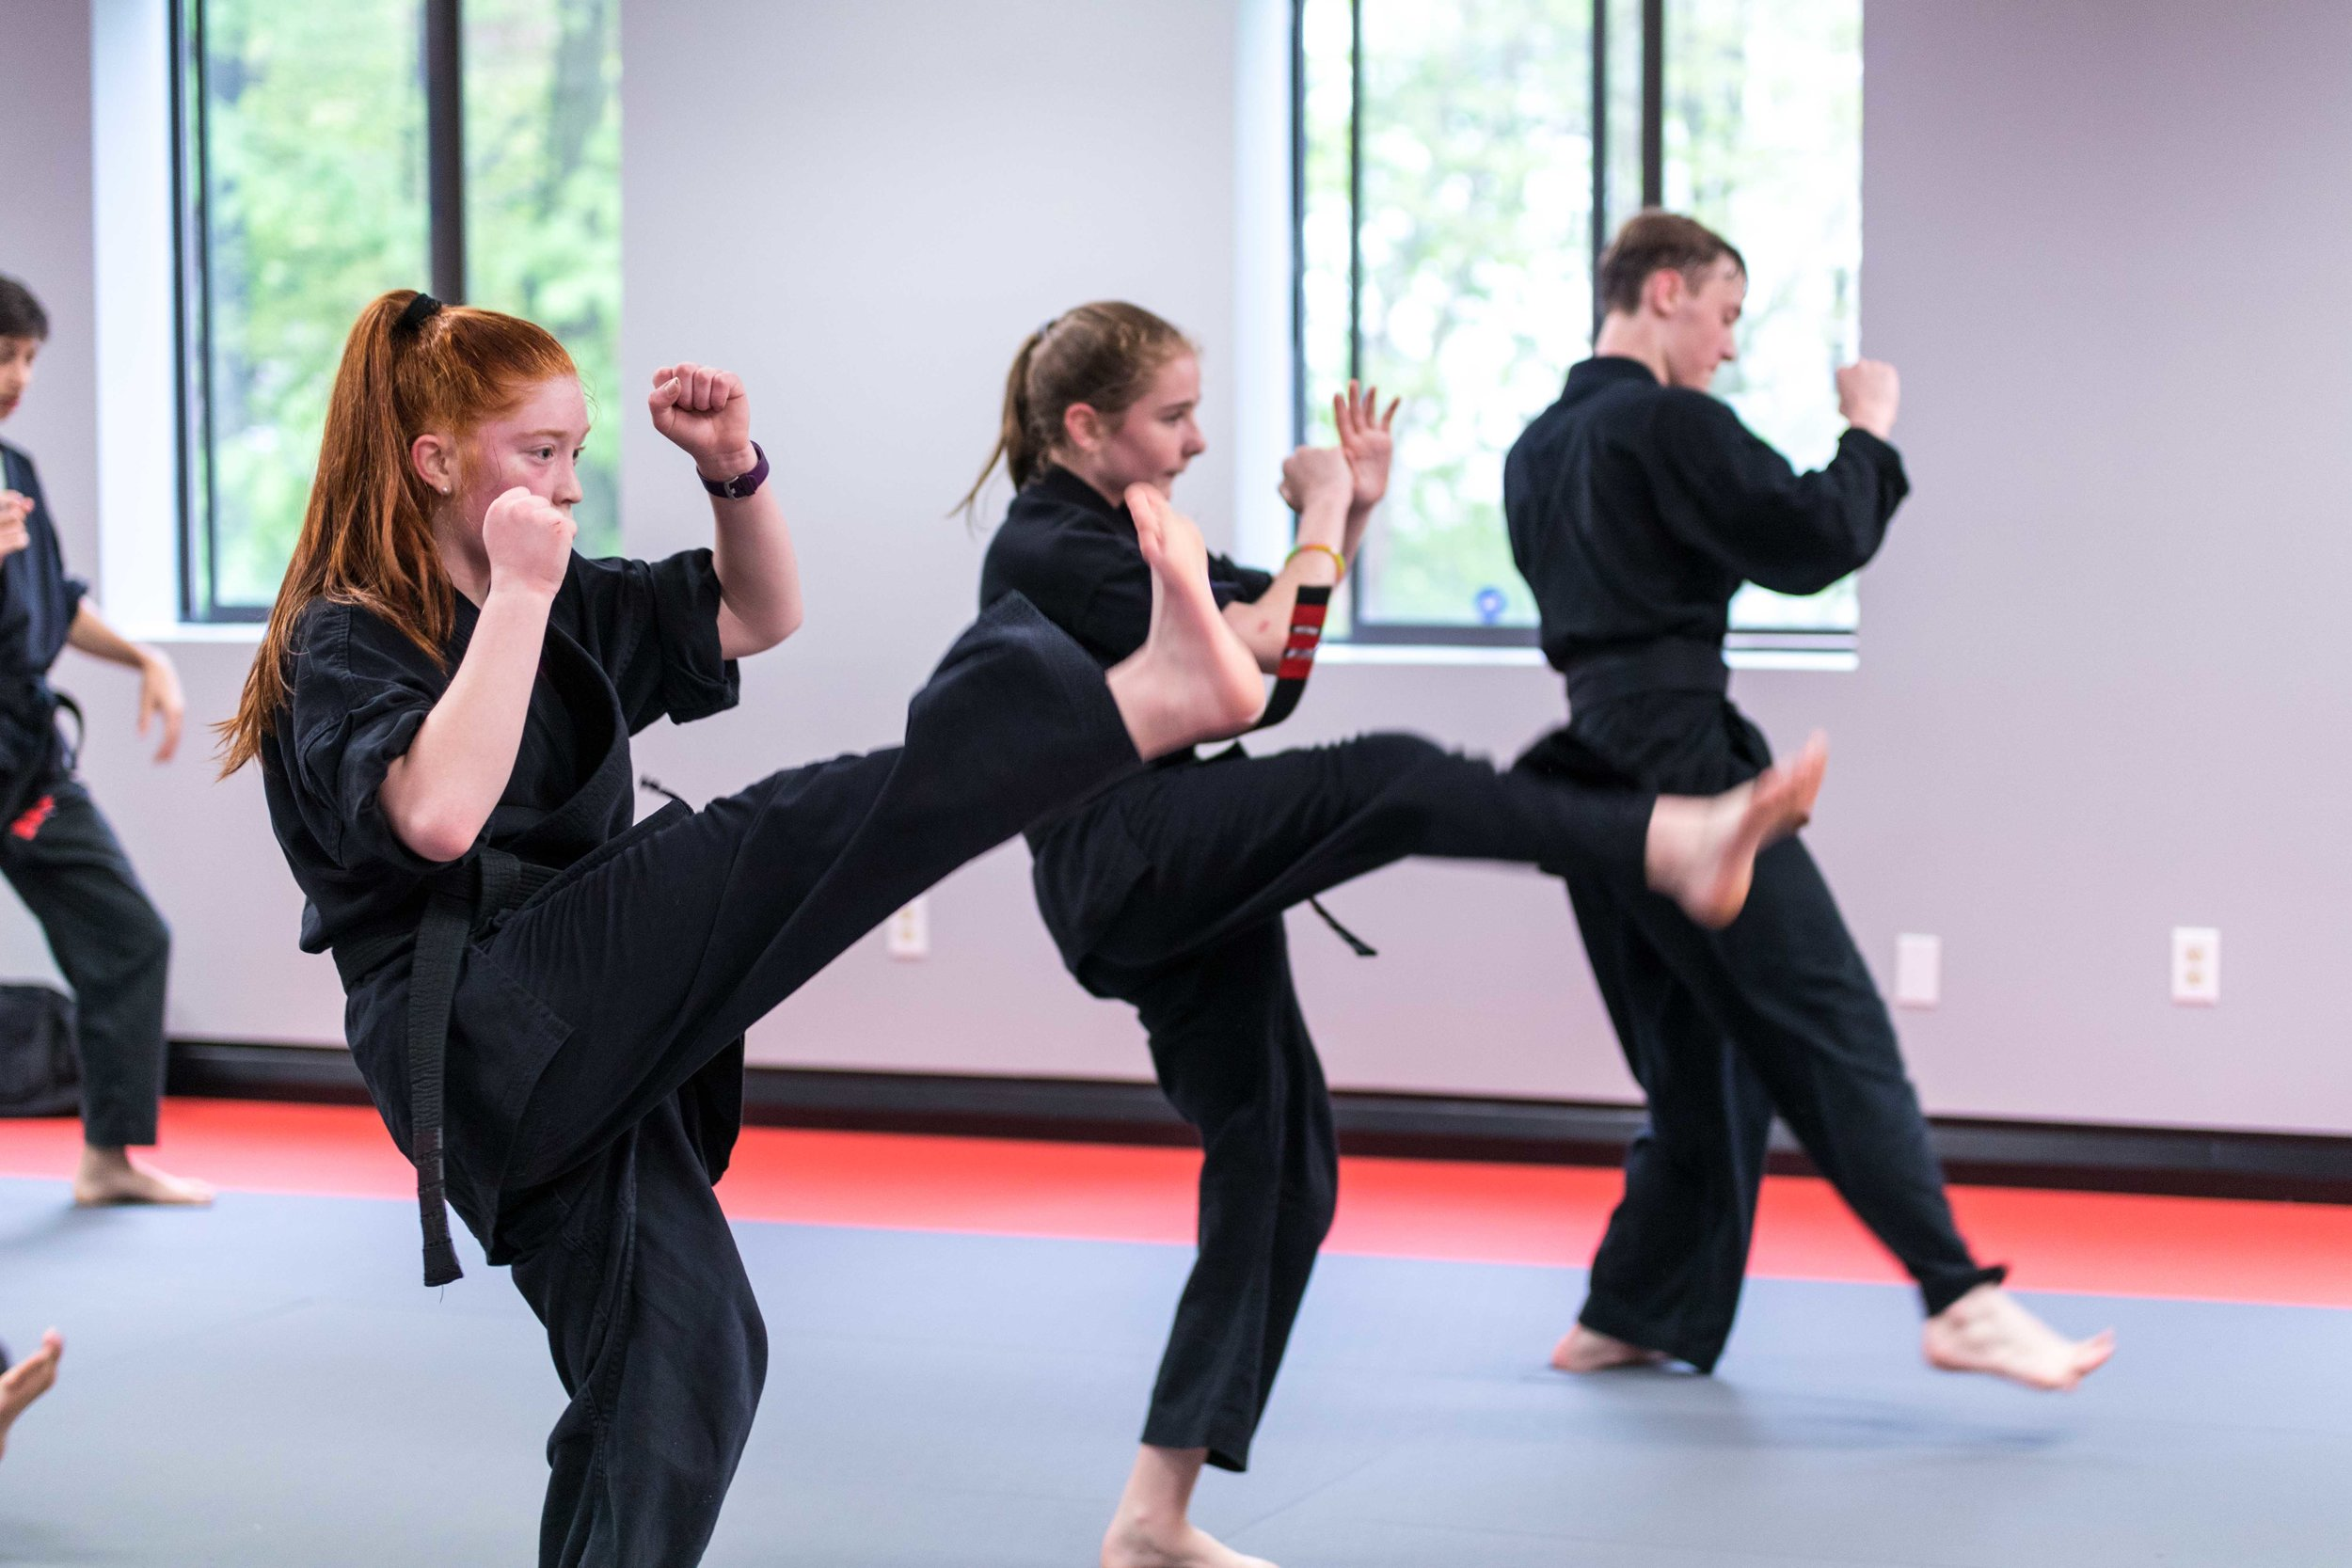 Karate Classes for Teenage Girls and Boys in Bedford Massachusetts at Callahan's Karate 1.jpg